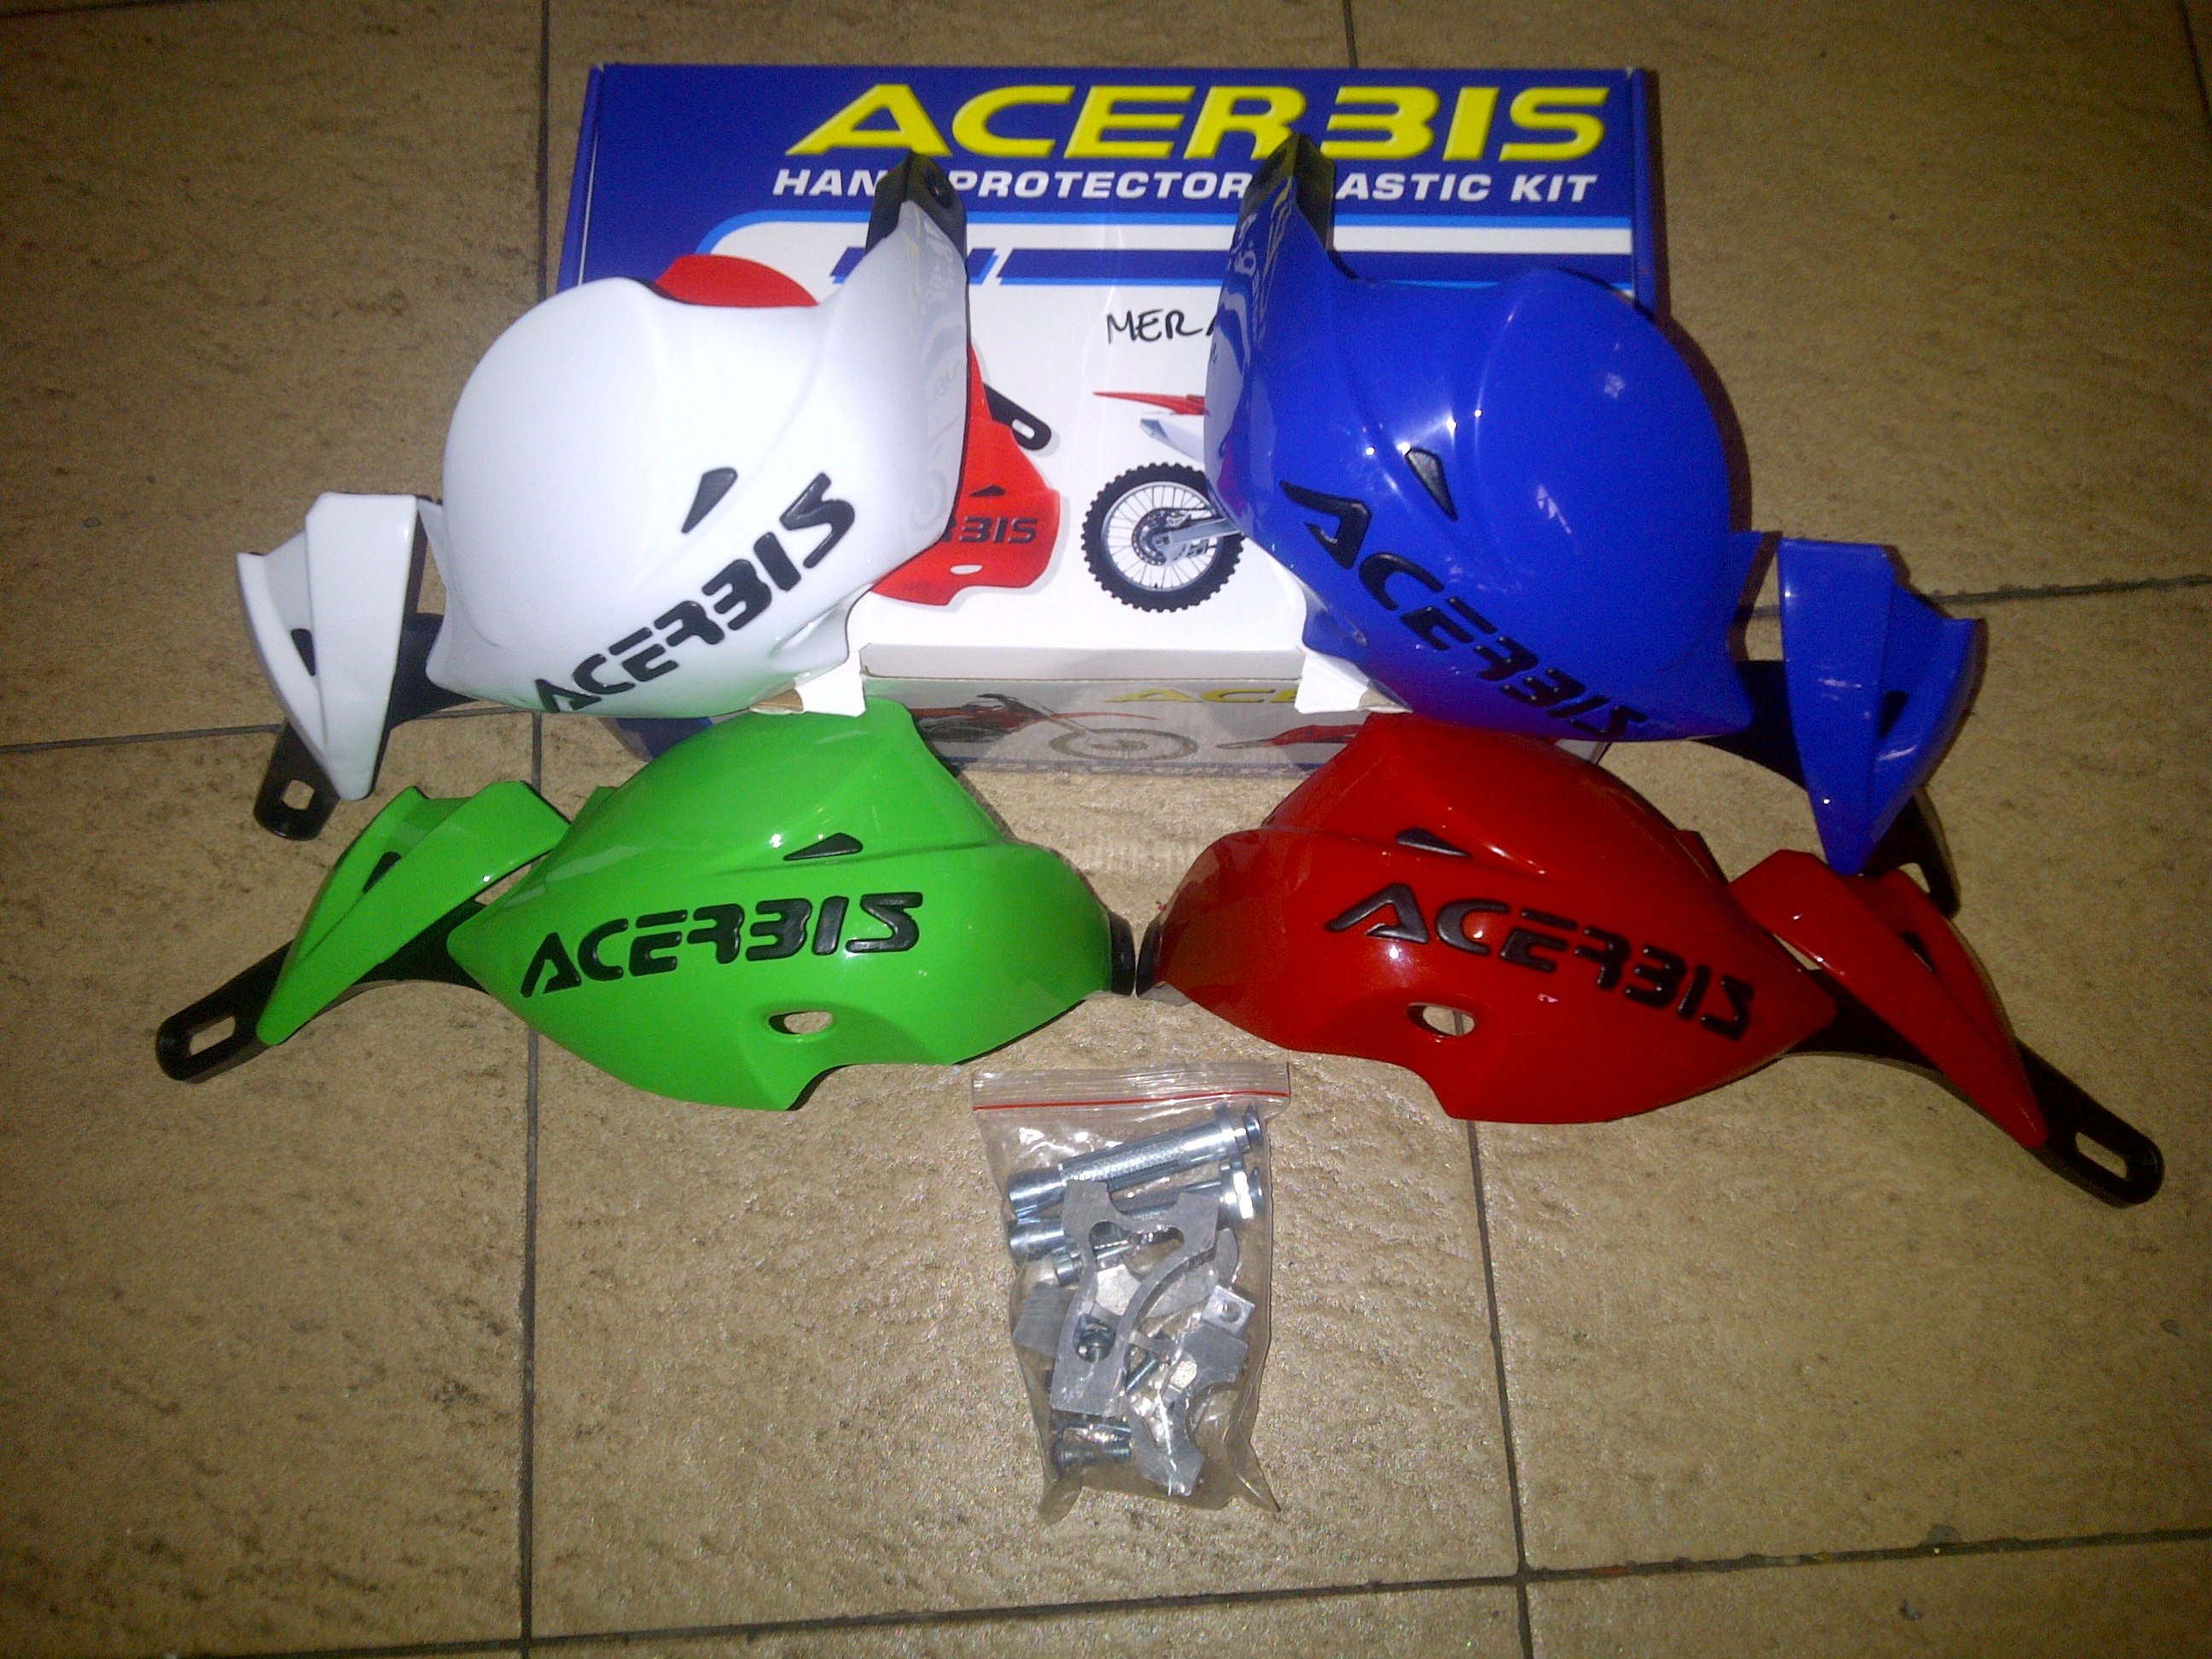 Kebon Jeruk 20130709 00564 Jual handguard acerbis plastic